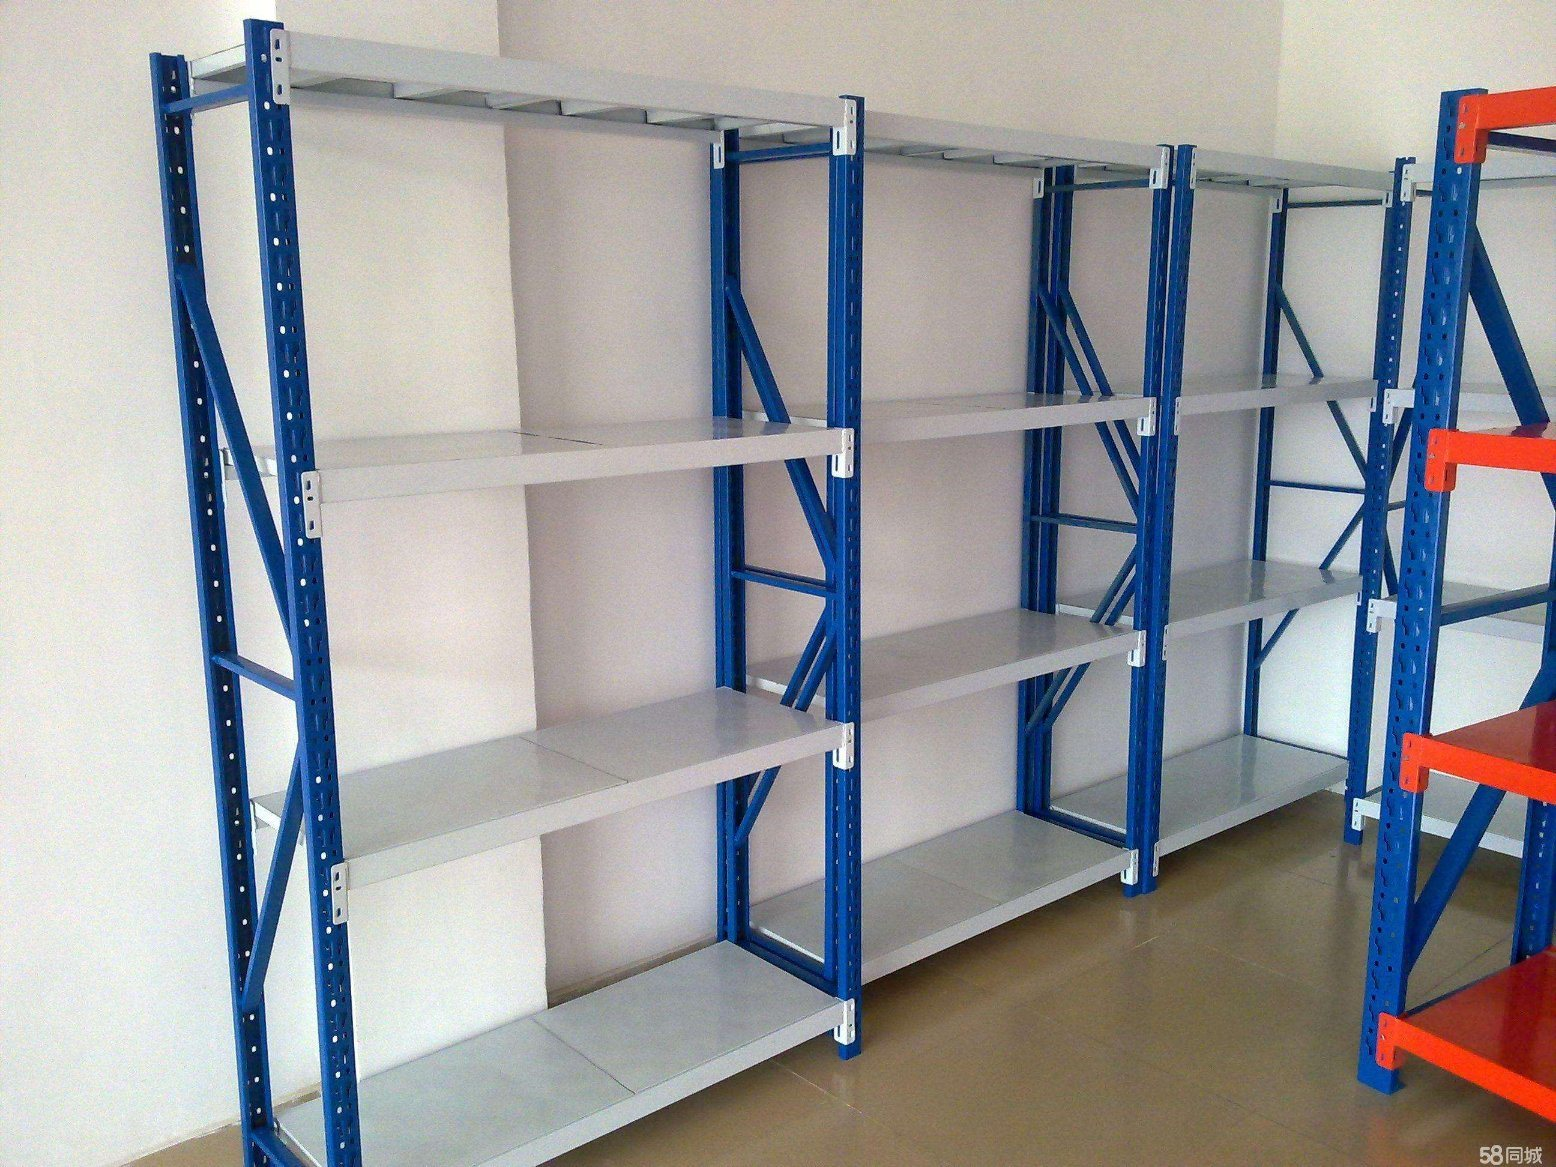 China Heavy Duty Shelf Warehouse Storage Industrial Steel